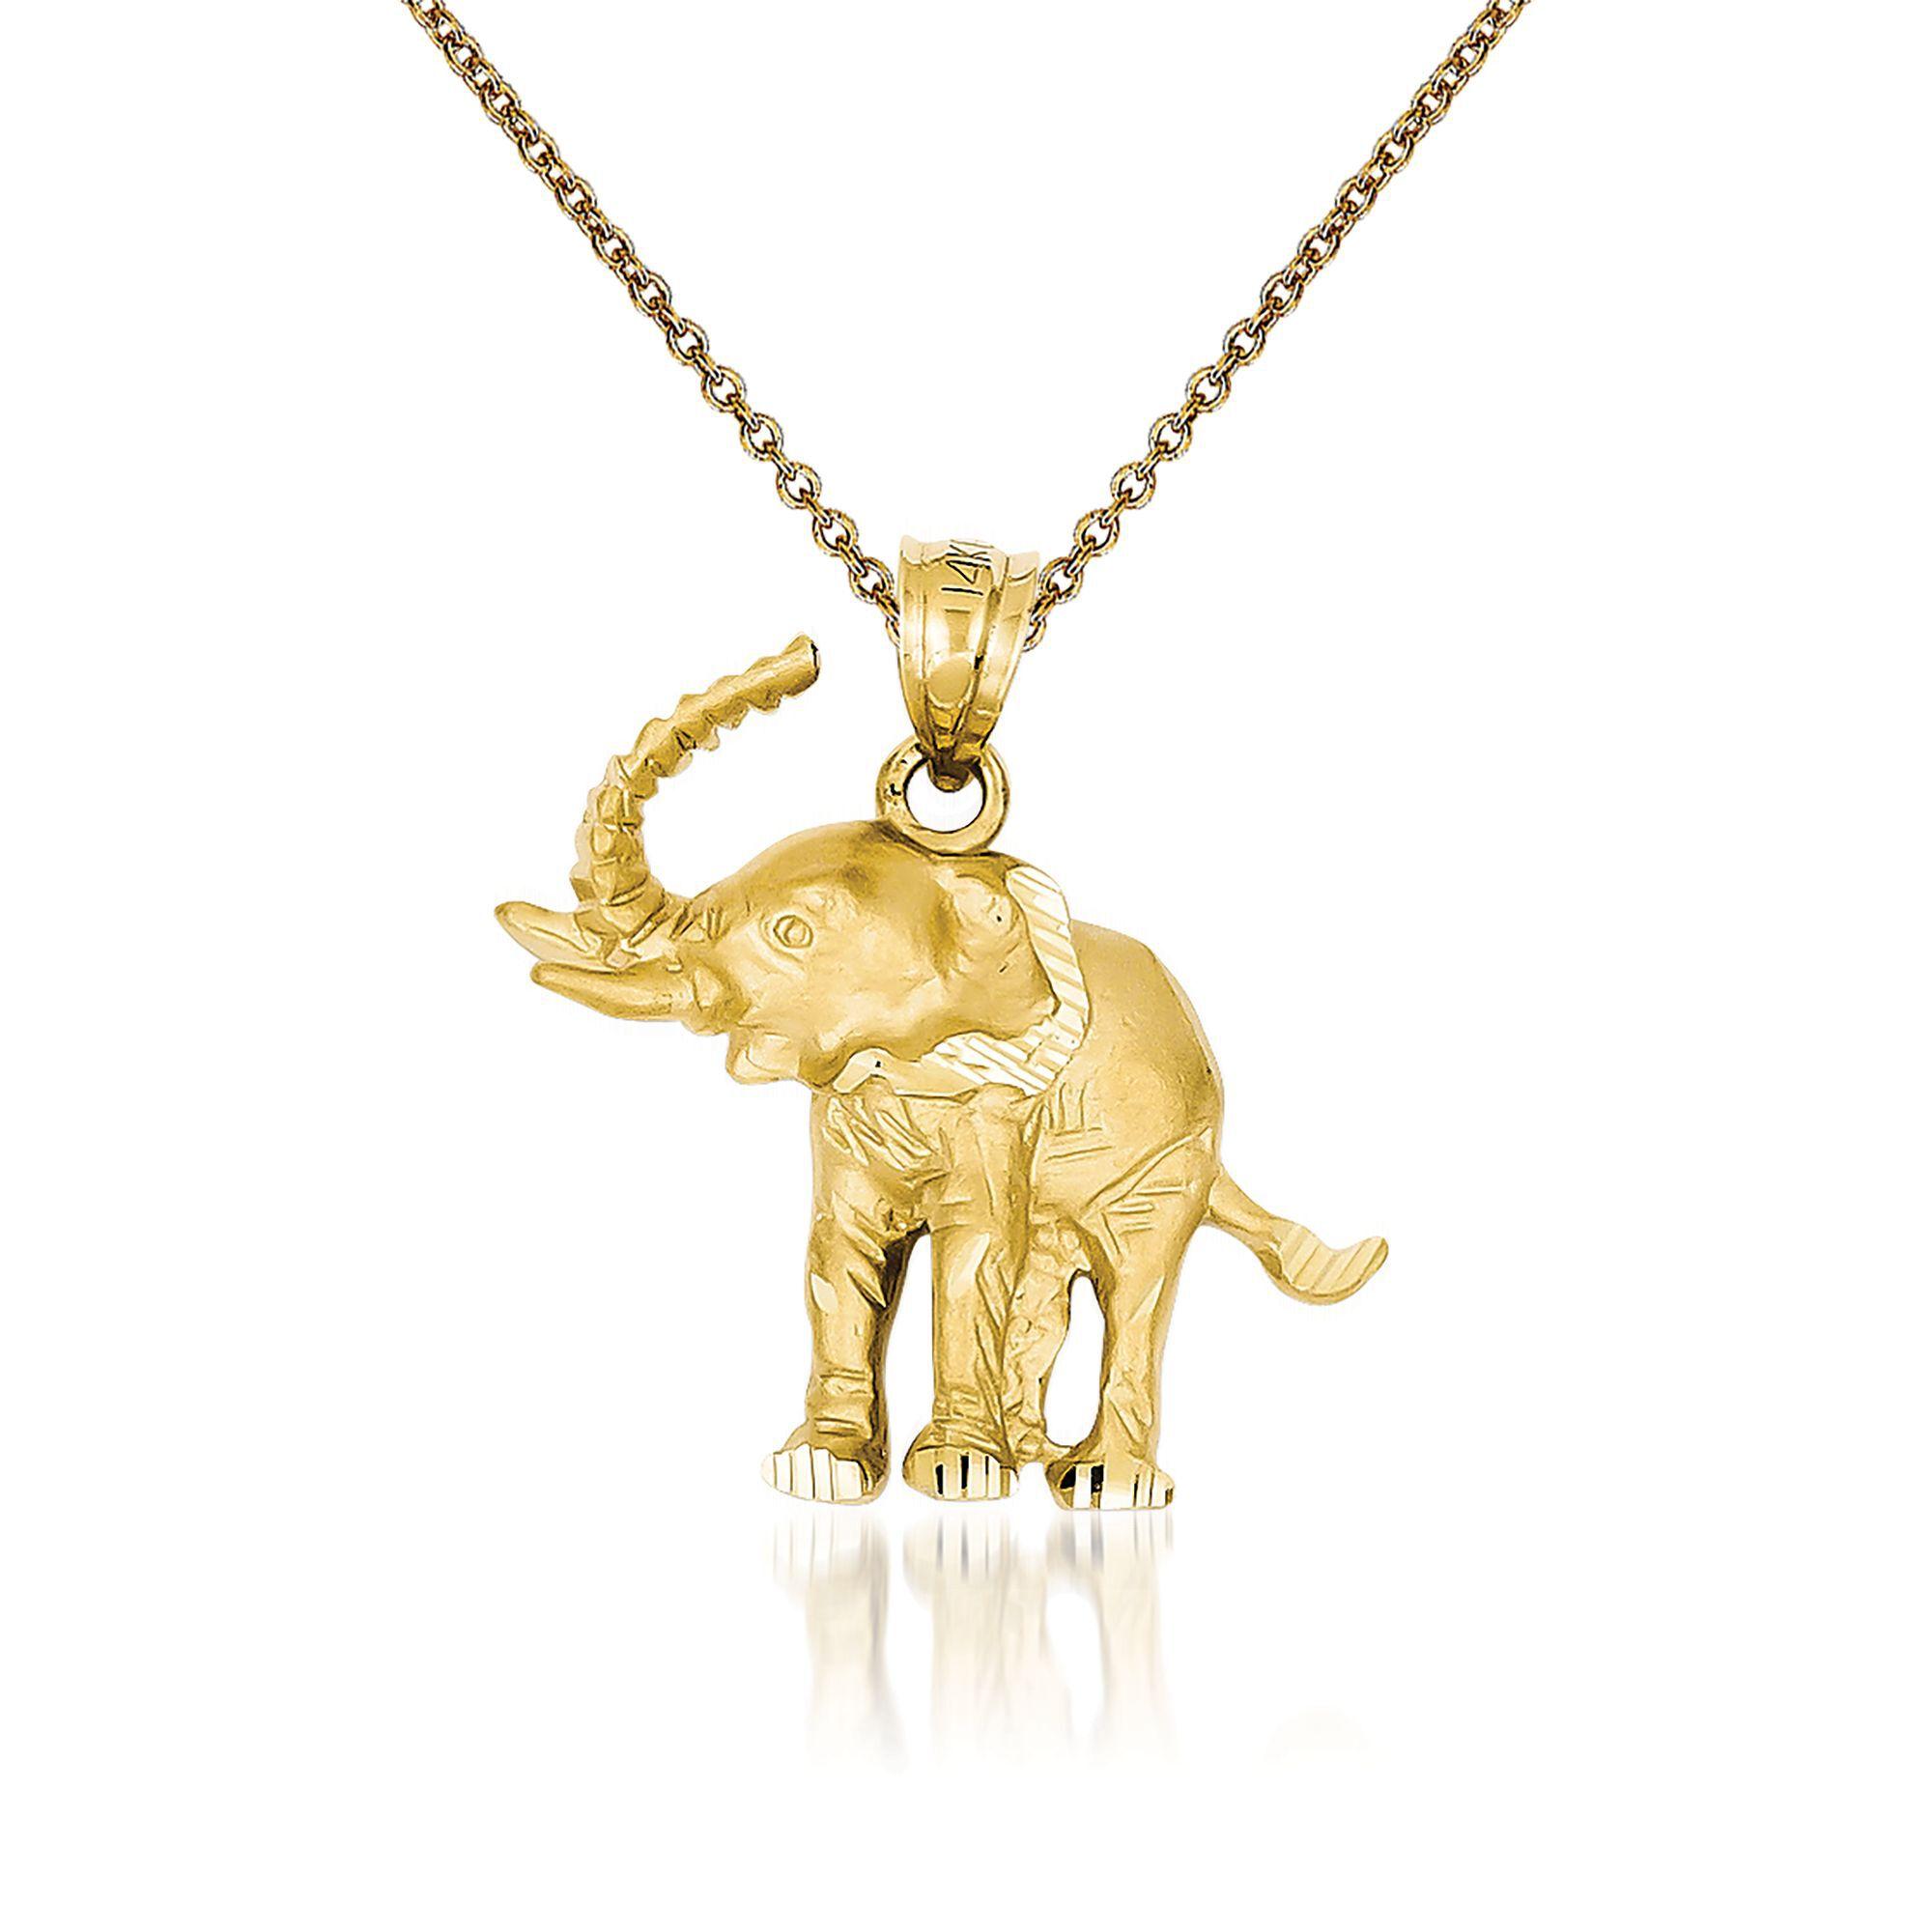 pendant for necklace New 14K Yellow Gold Natural Rose Quartz elephant charm